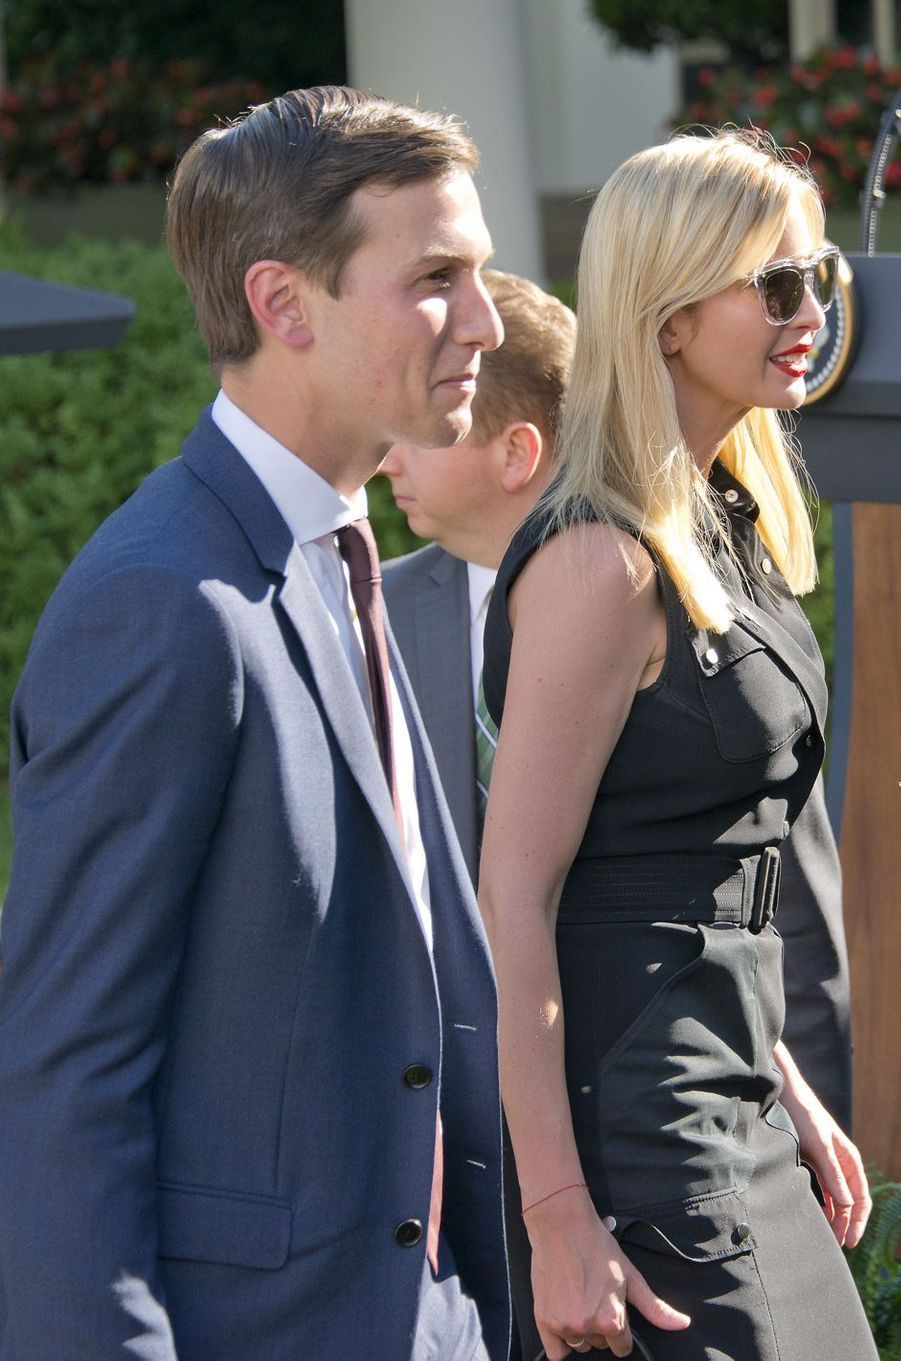 Ivanka Trump et Jared Kushner à la Maison Blanche, le 26 juin 2017.